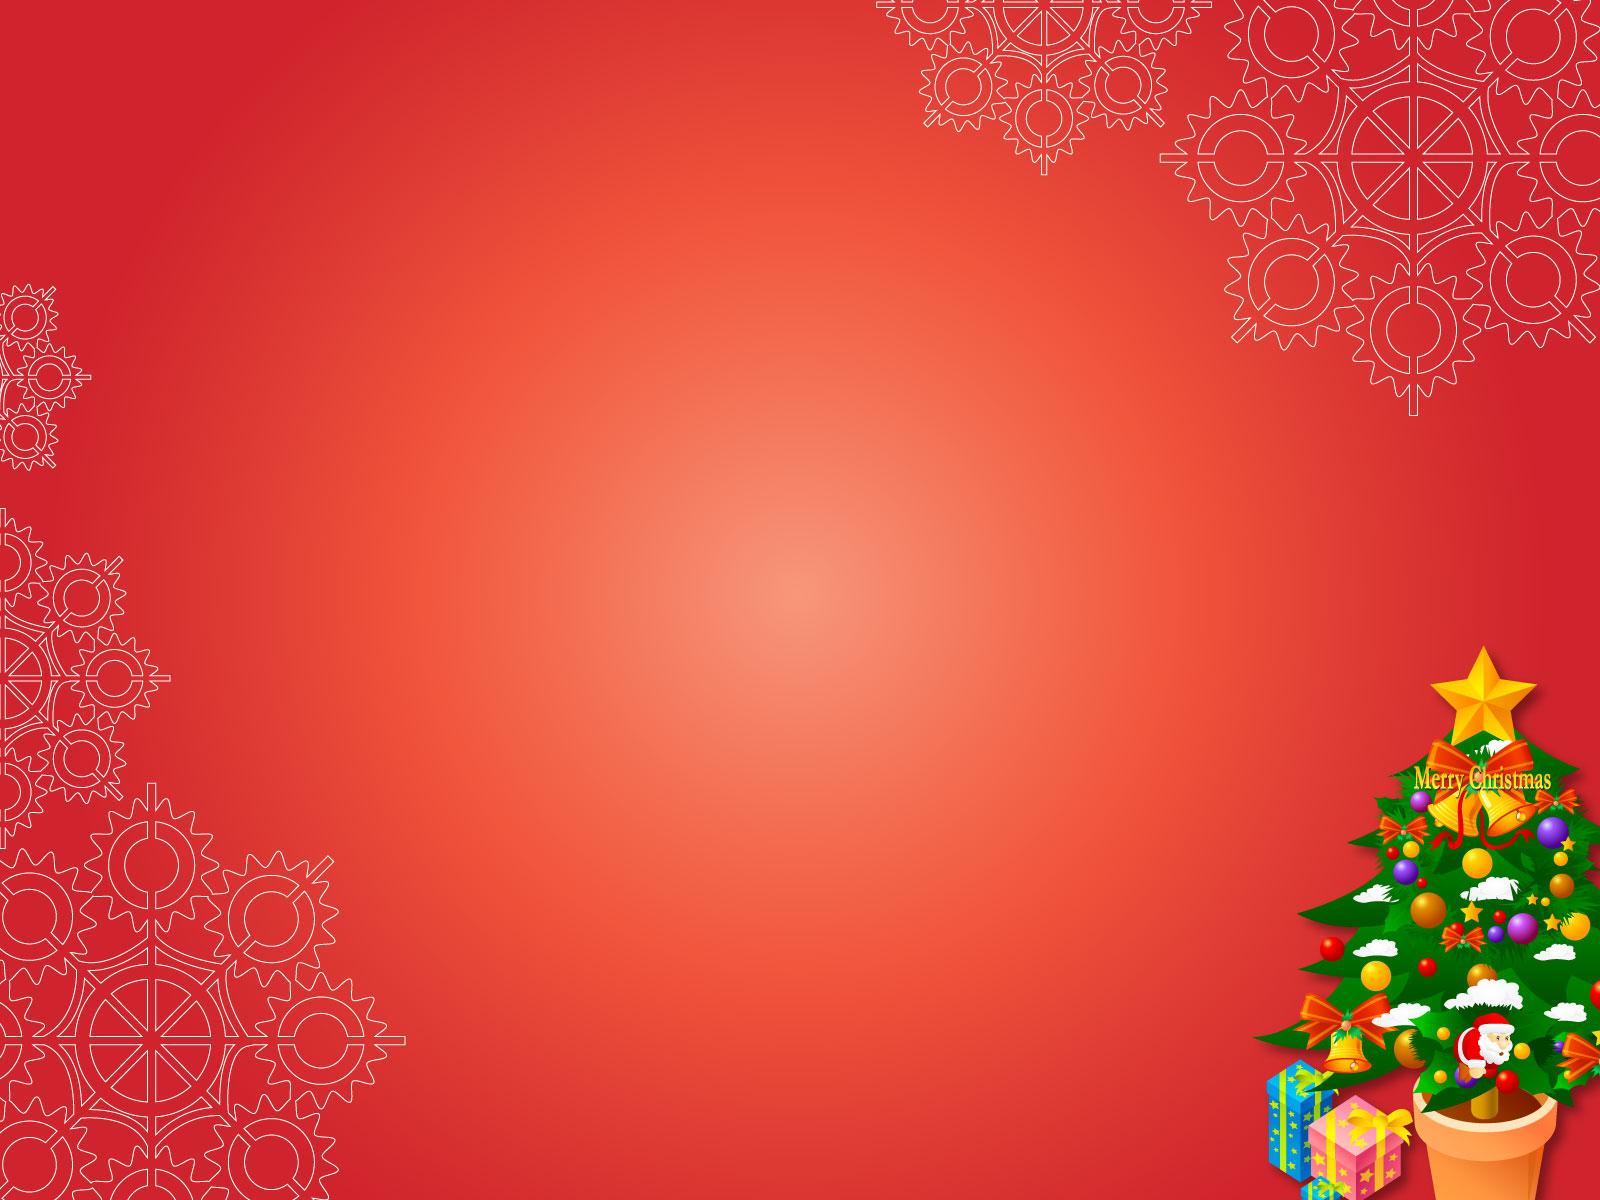 Labels Christmas Backgrounds Christmas Decor Christmas Wallpapers 1600x1200